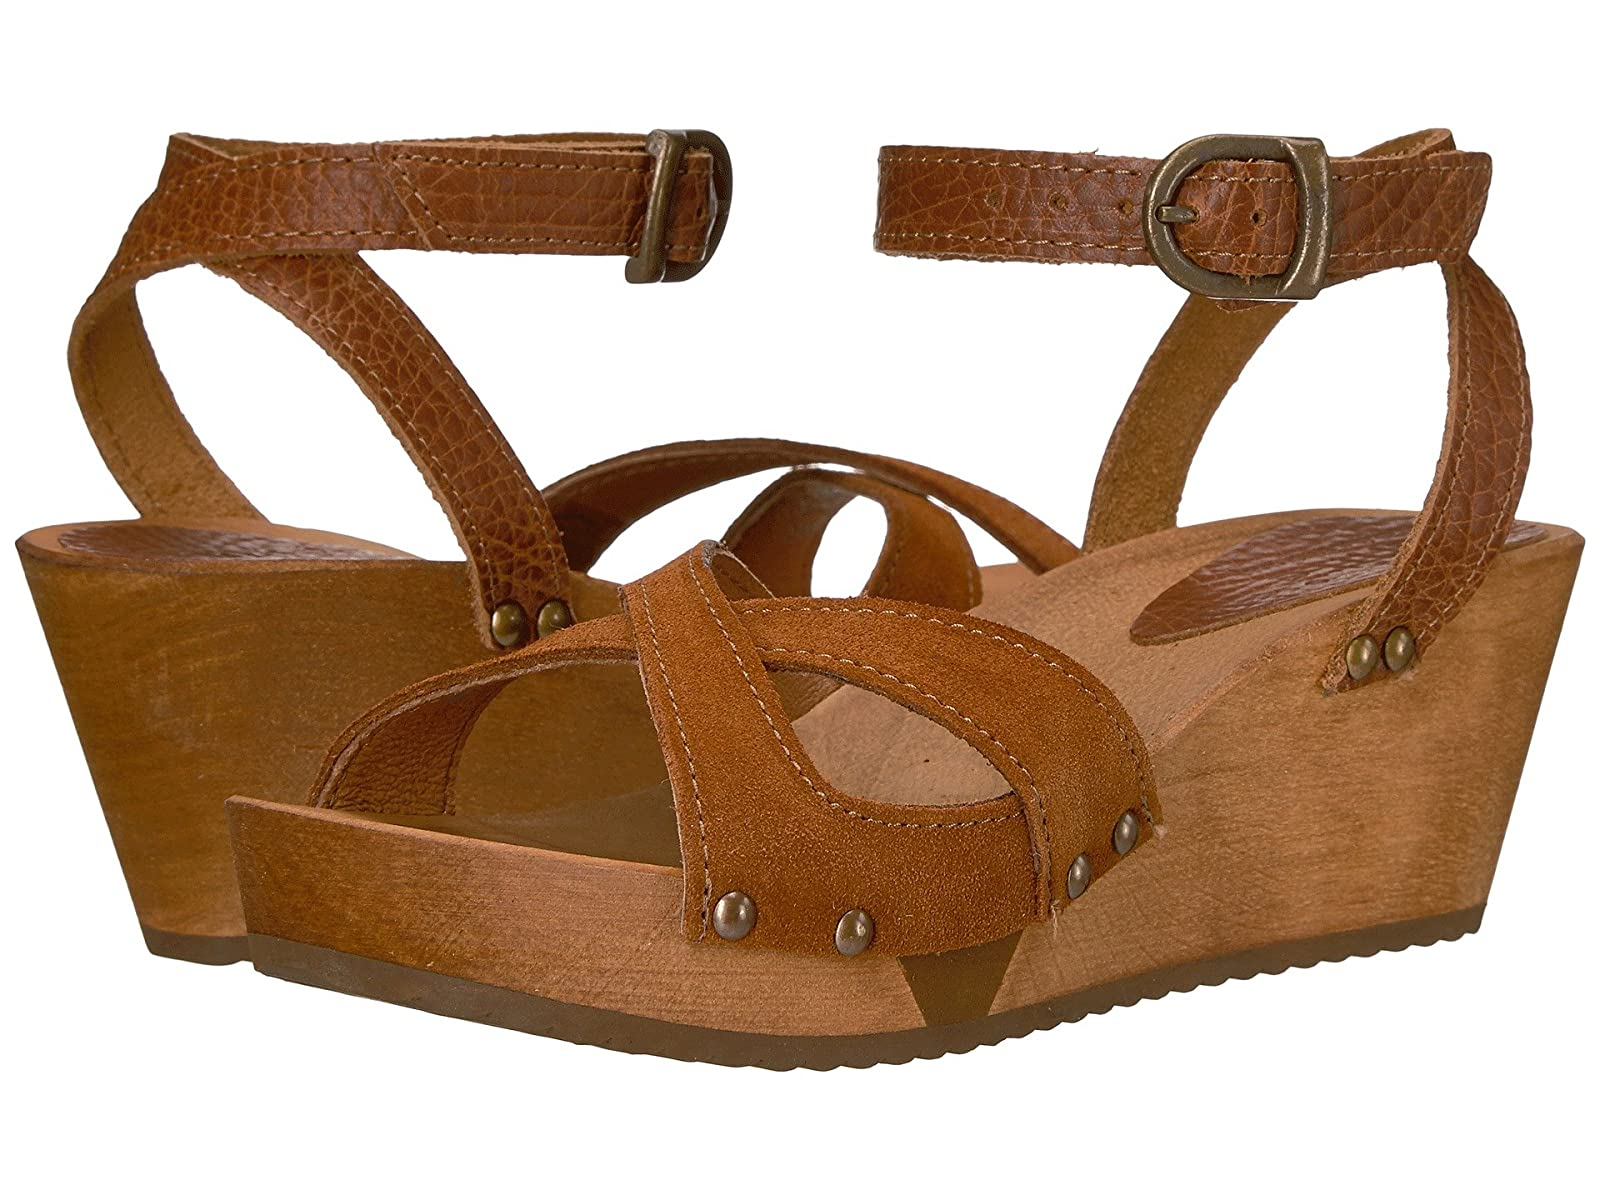 Sanita Thalia Wedge Flex SandalCheap and distinctive eye-catching shoes